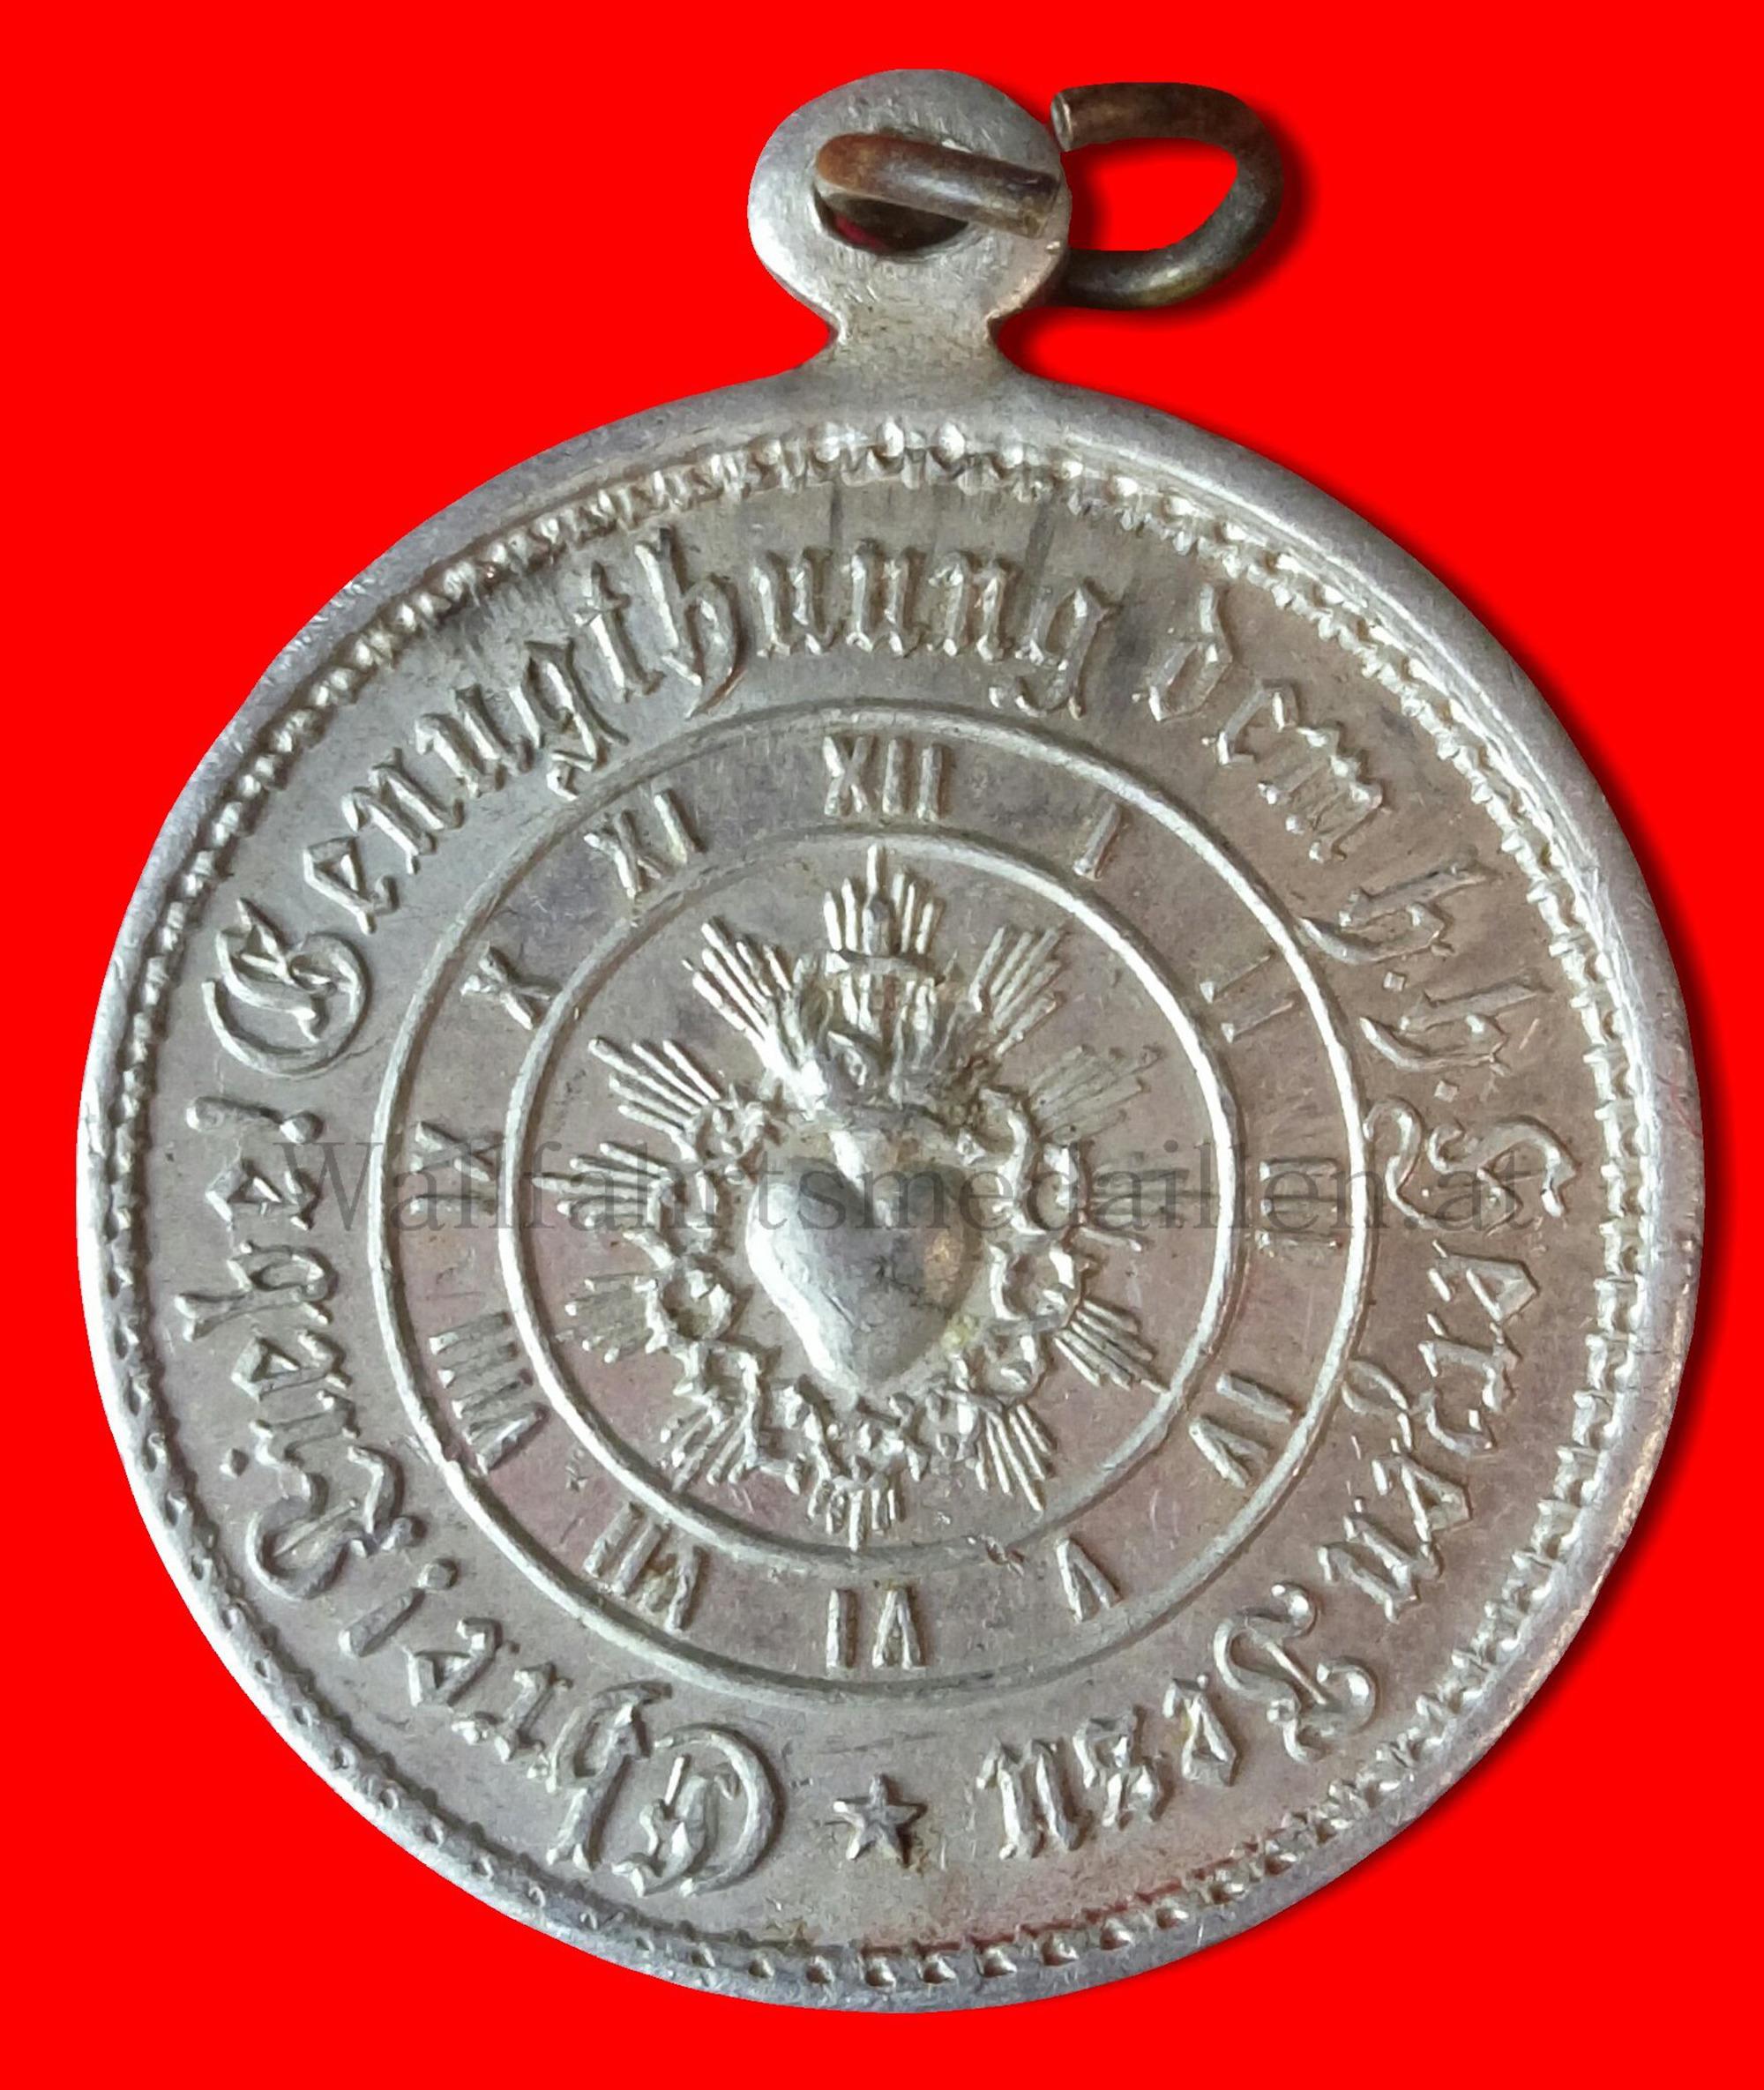 Medaille der Erzbruderschaft des heiligen Herzens